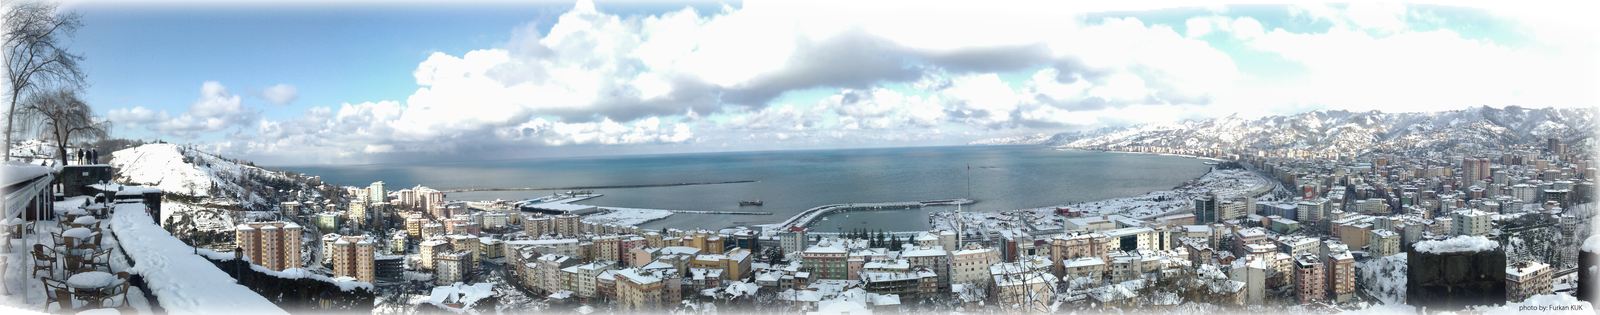 Rize Panorama by fuki53